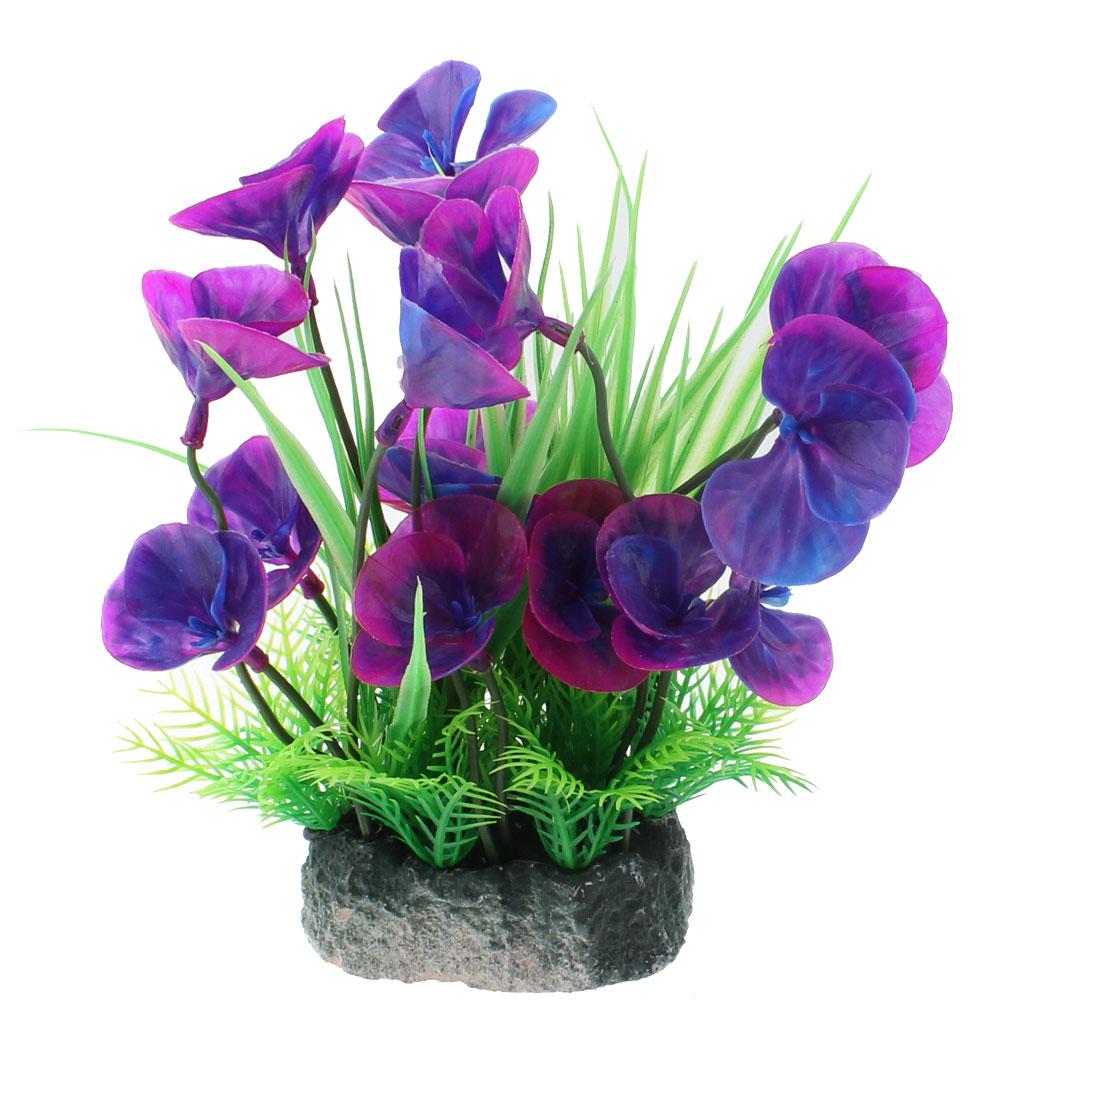 Aquarium Fish Tank Artificial Plastic Water Plant Grass Decor Ornament Purple